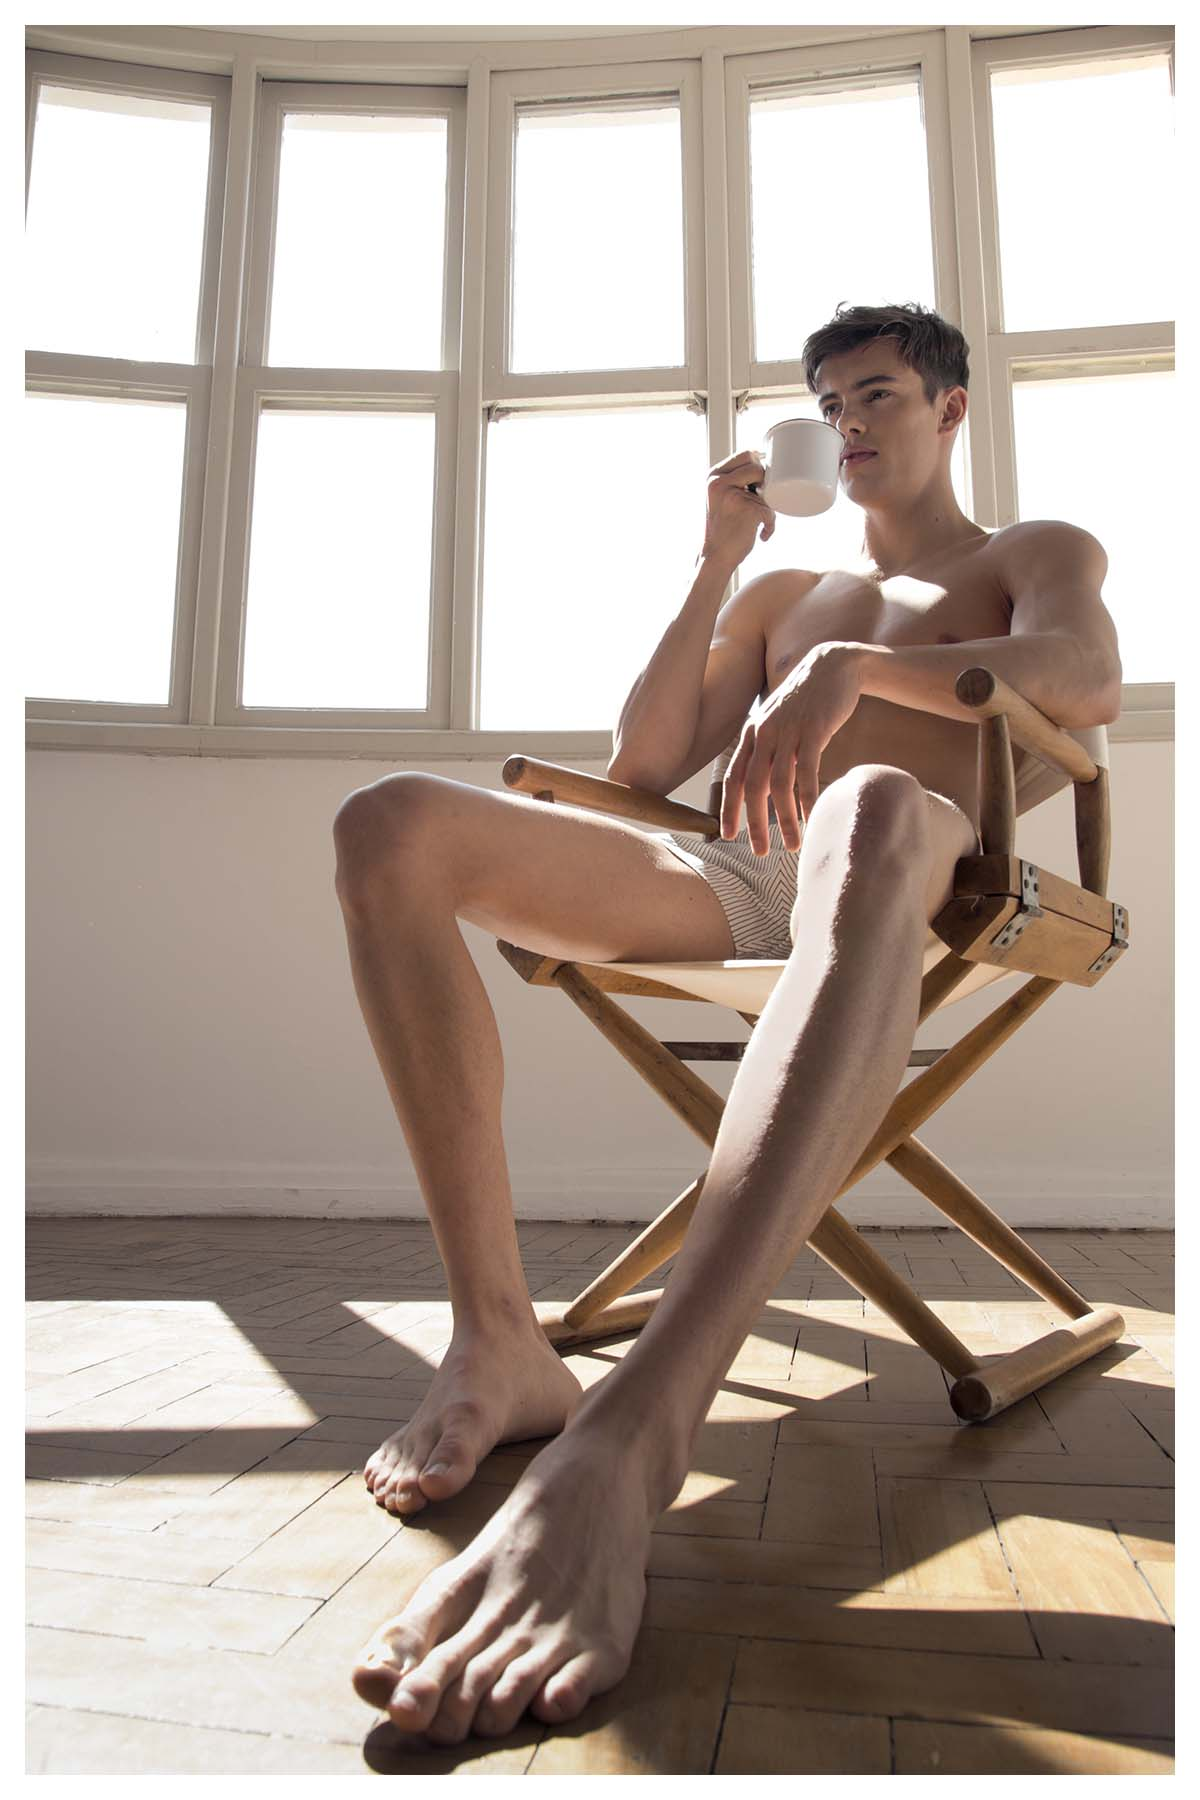 Augusto Moraes by Filipe Galgani for Brazilian Male Model